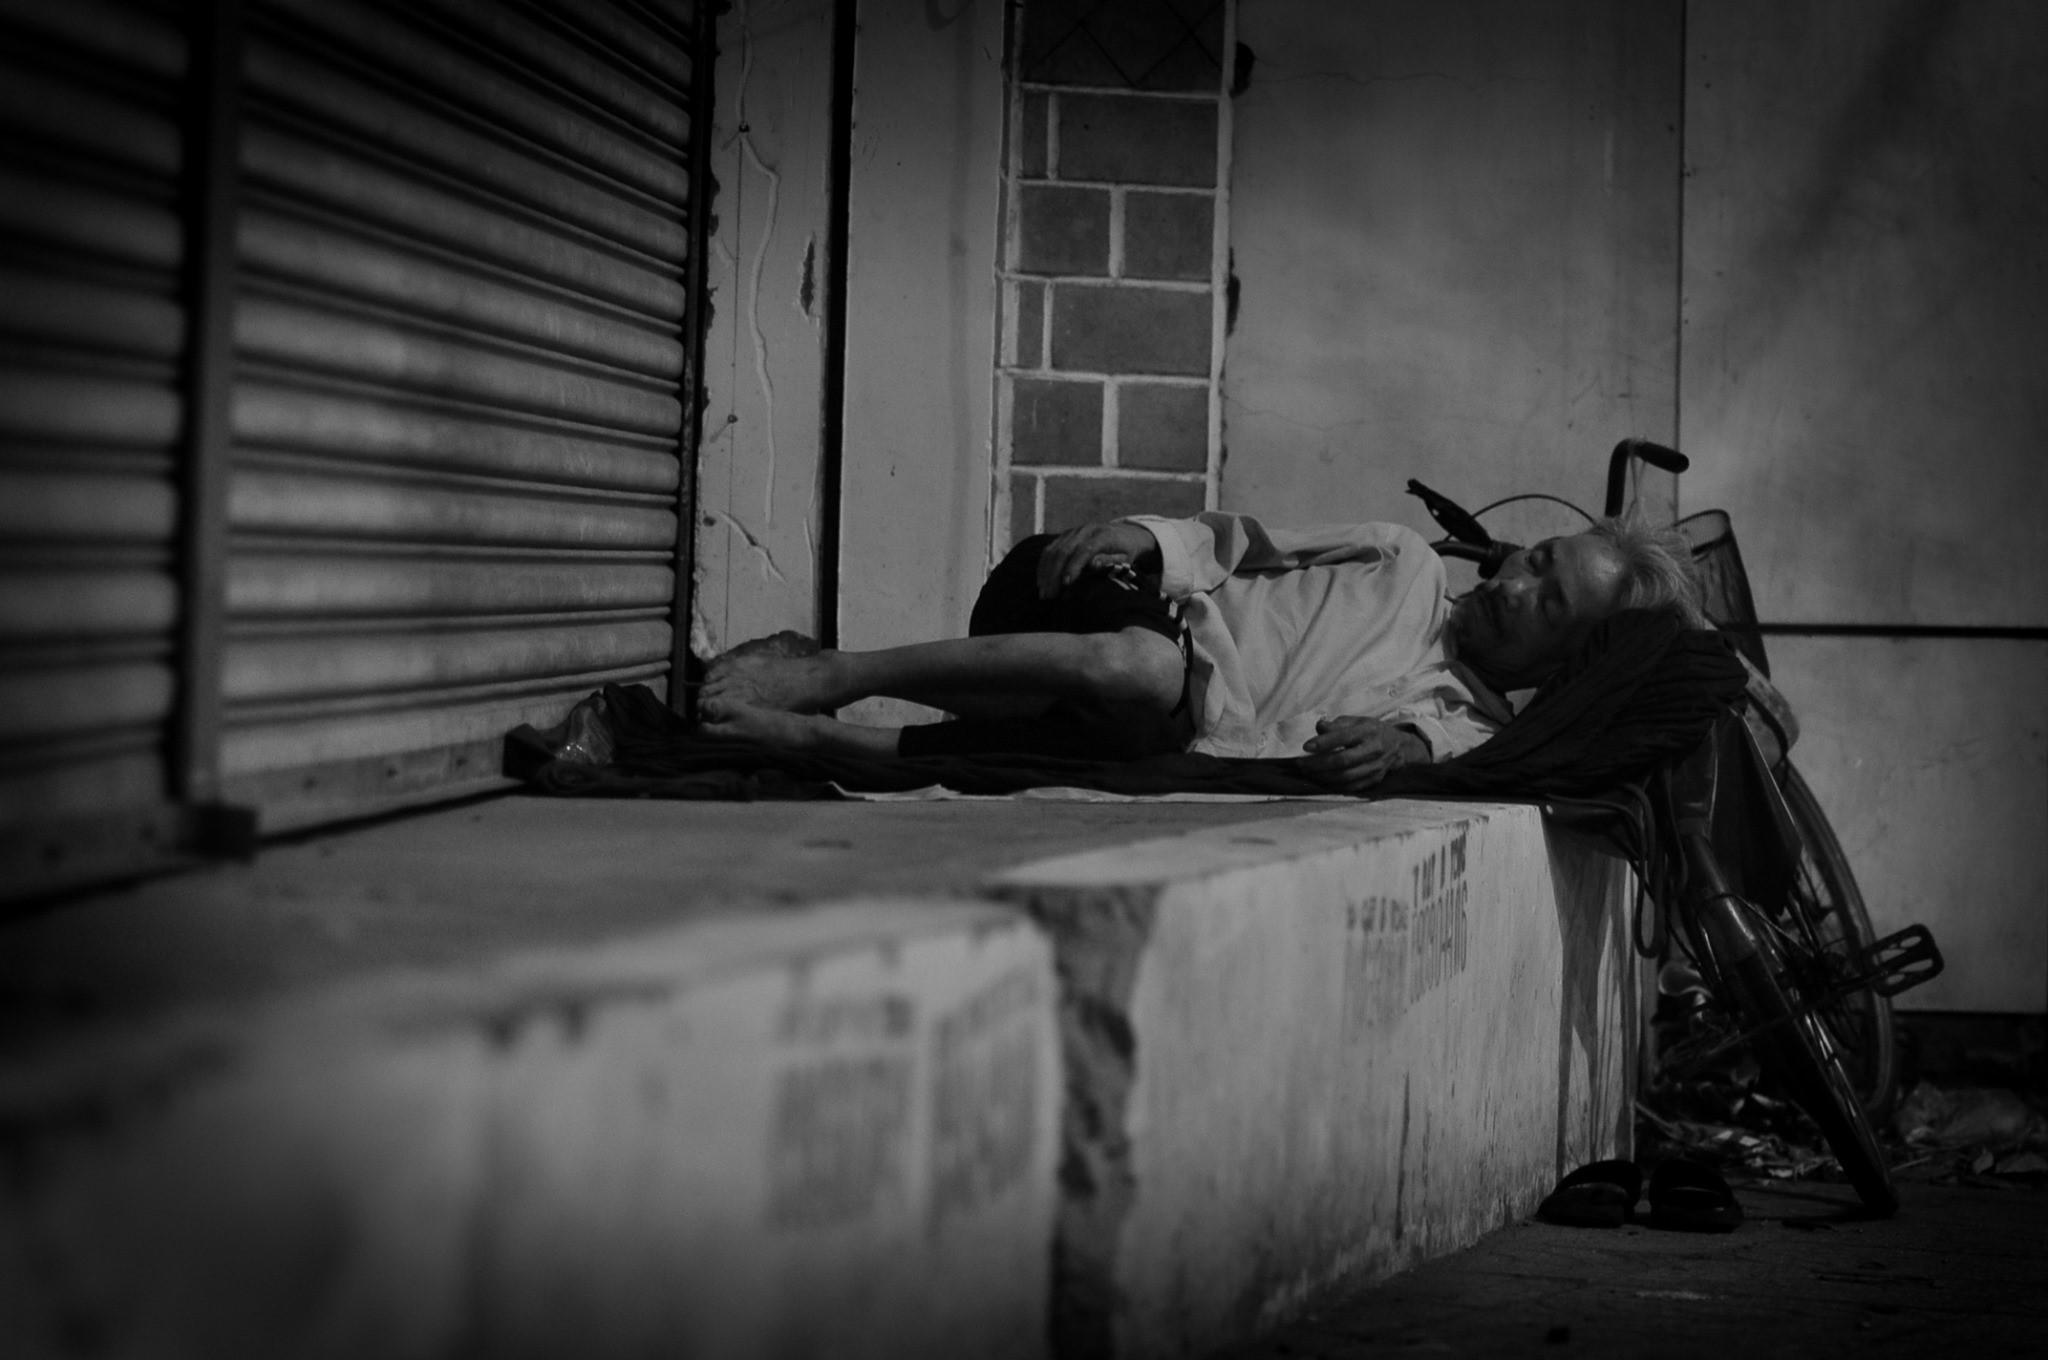 homeless man in Saigon